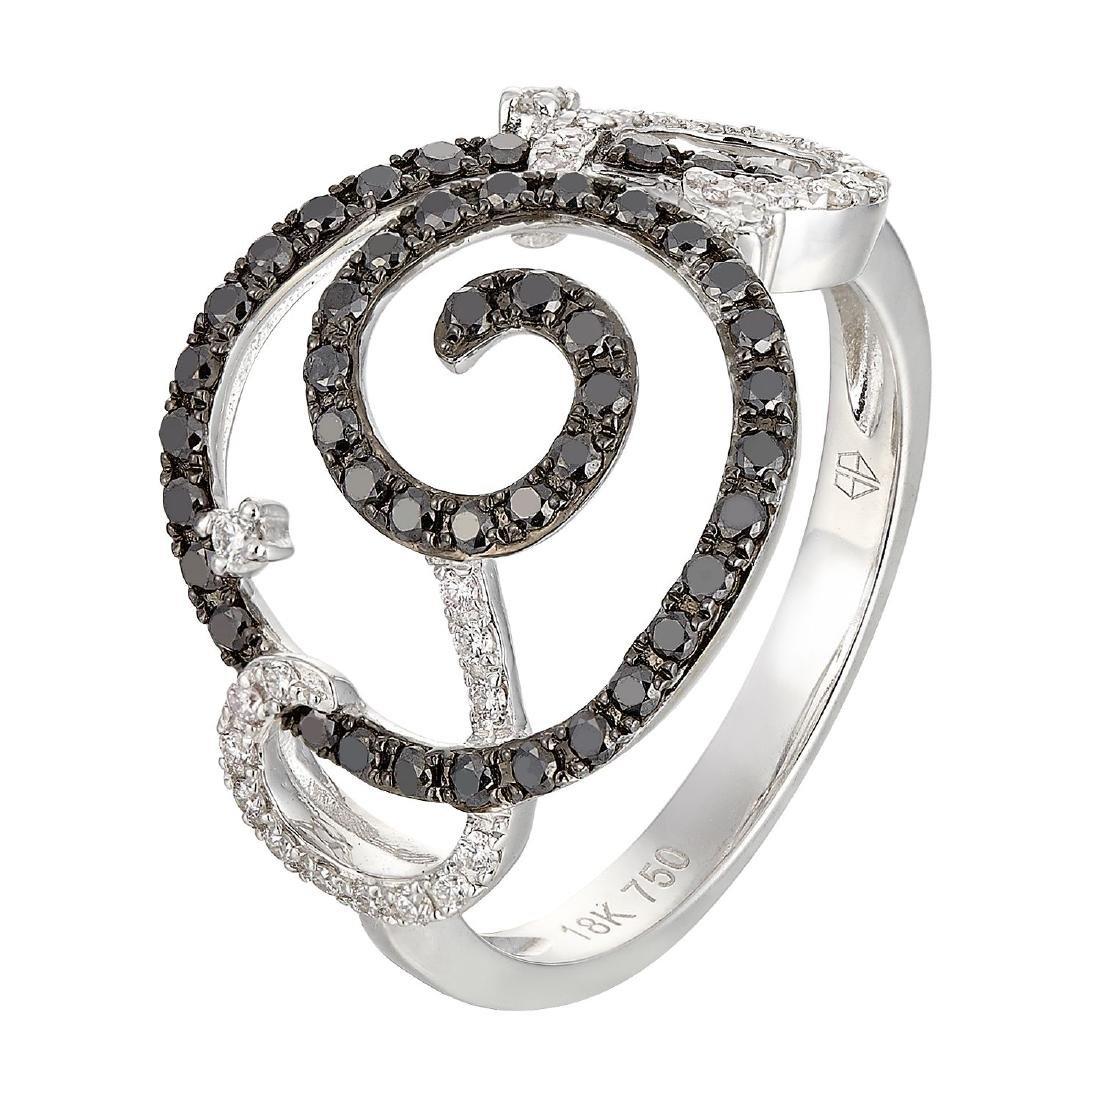 18k Gold 0.50ctw Women's Diamond Cocktail Ring Size 6.5